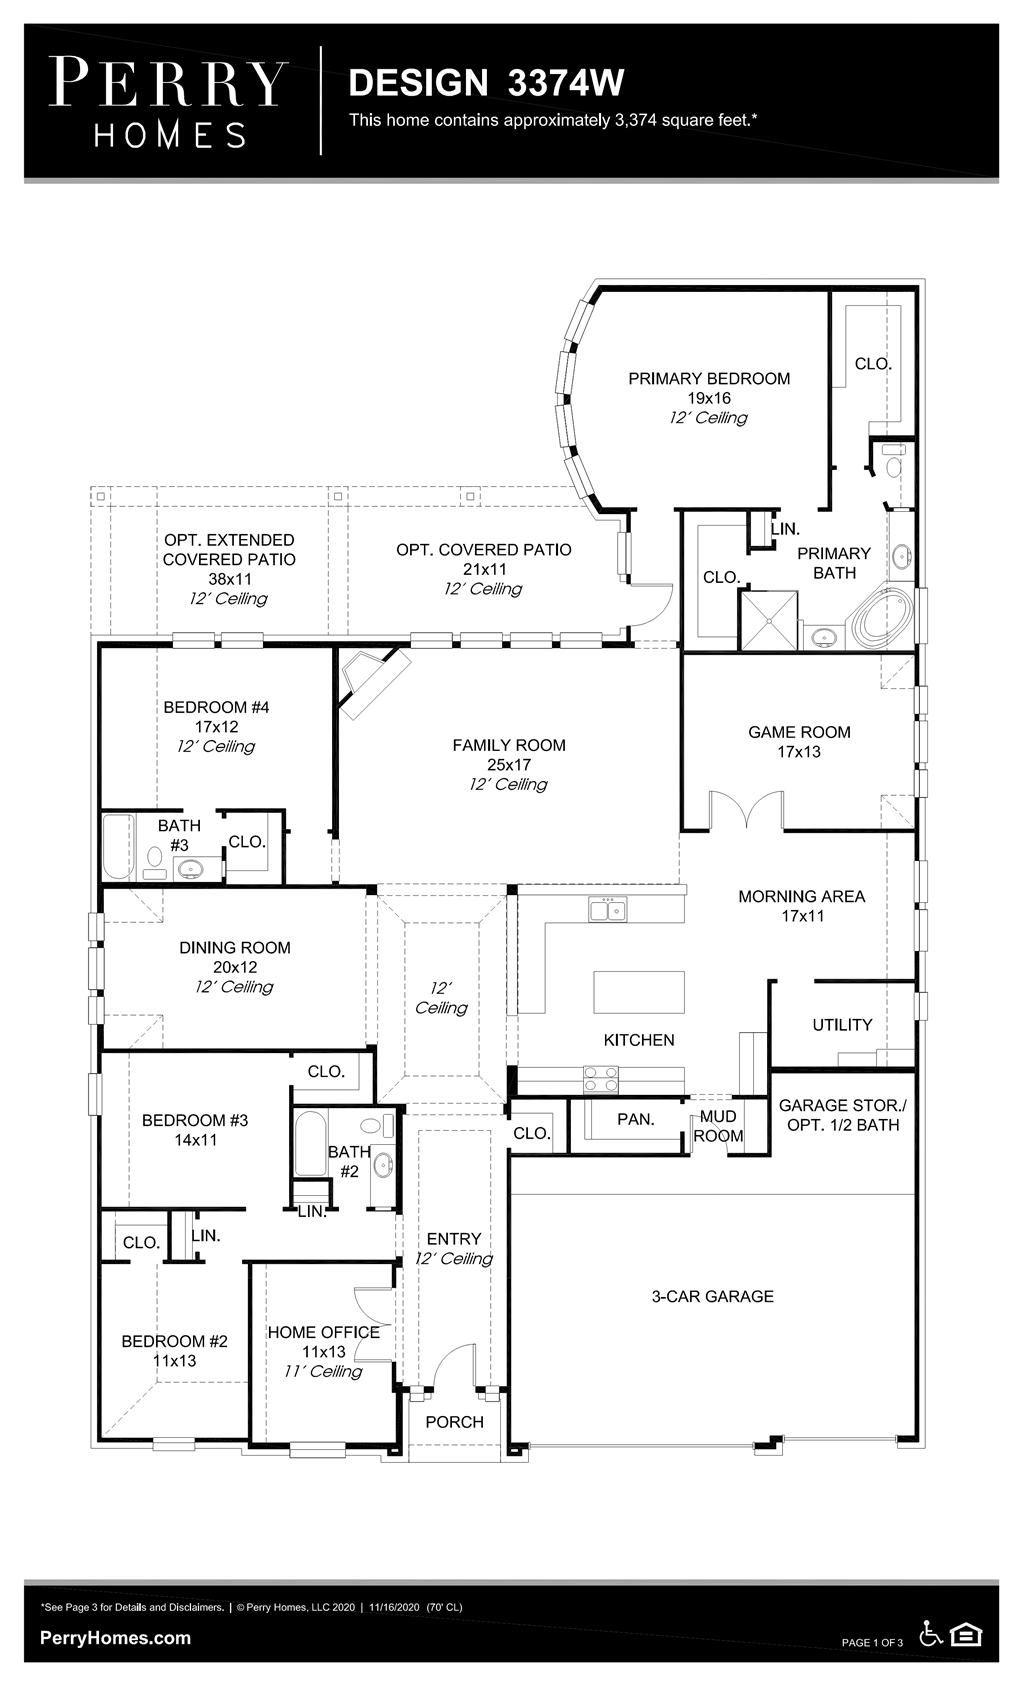 Floor Plan for 3374W